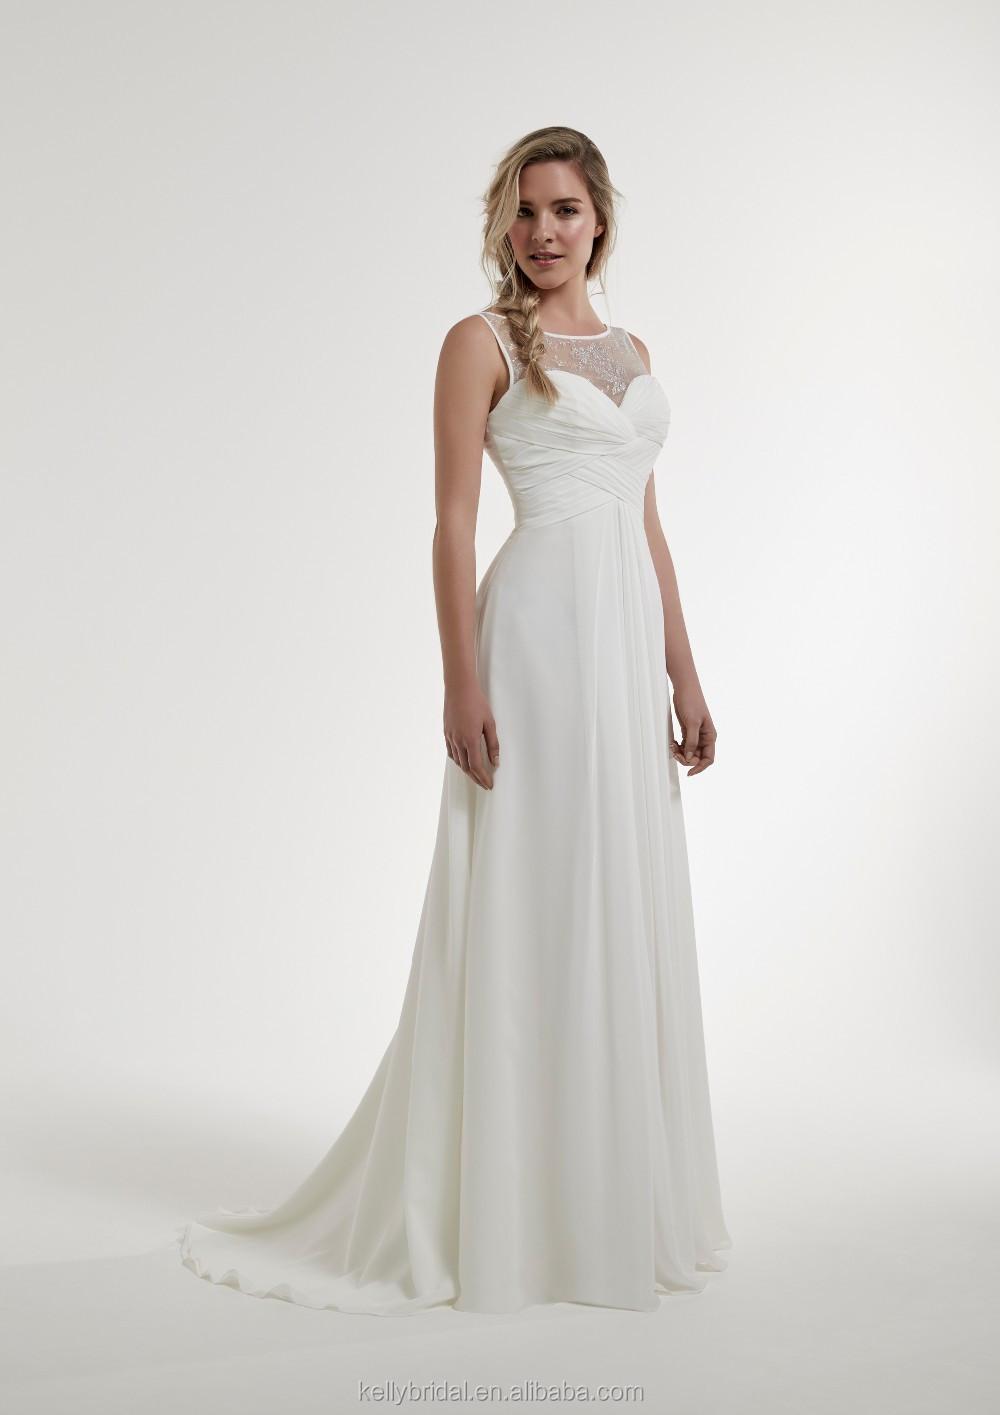 Zm16139 Chiffon Grecian Style Wedding Dresses Pleated Simple High